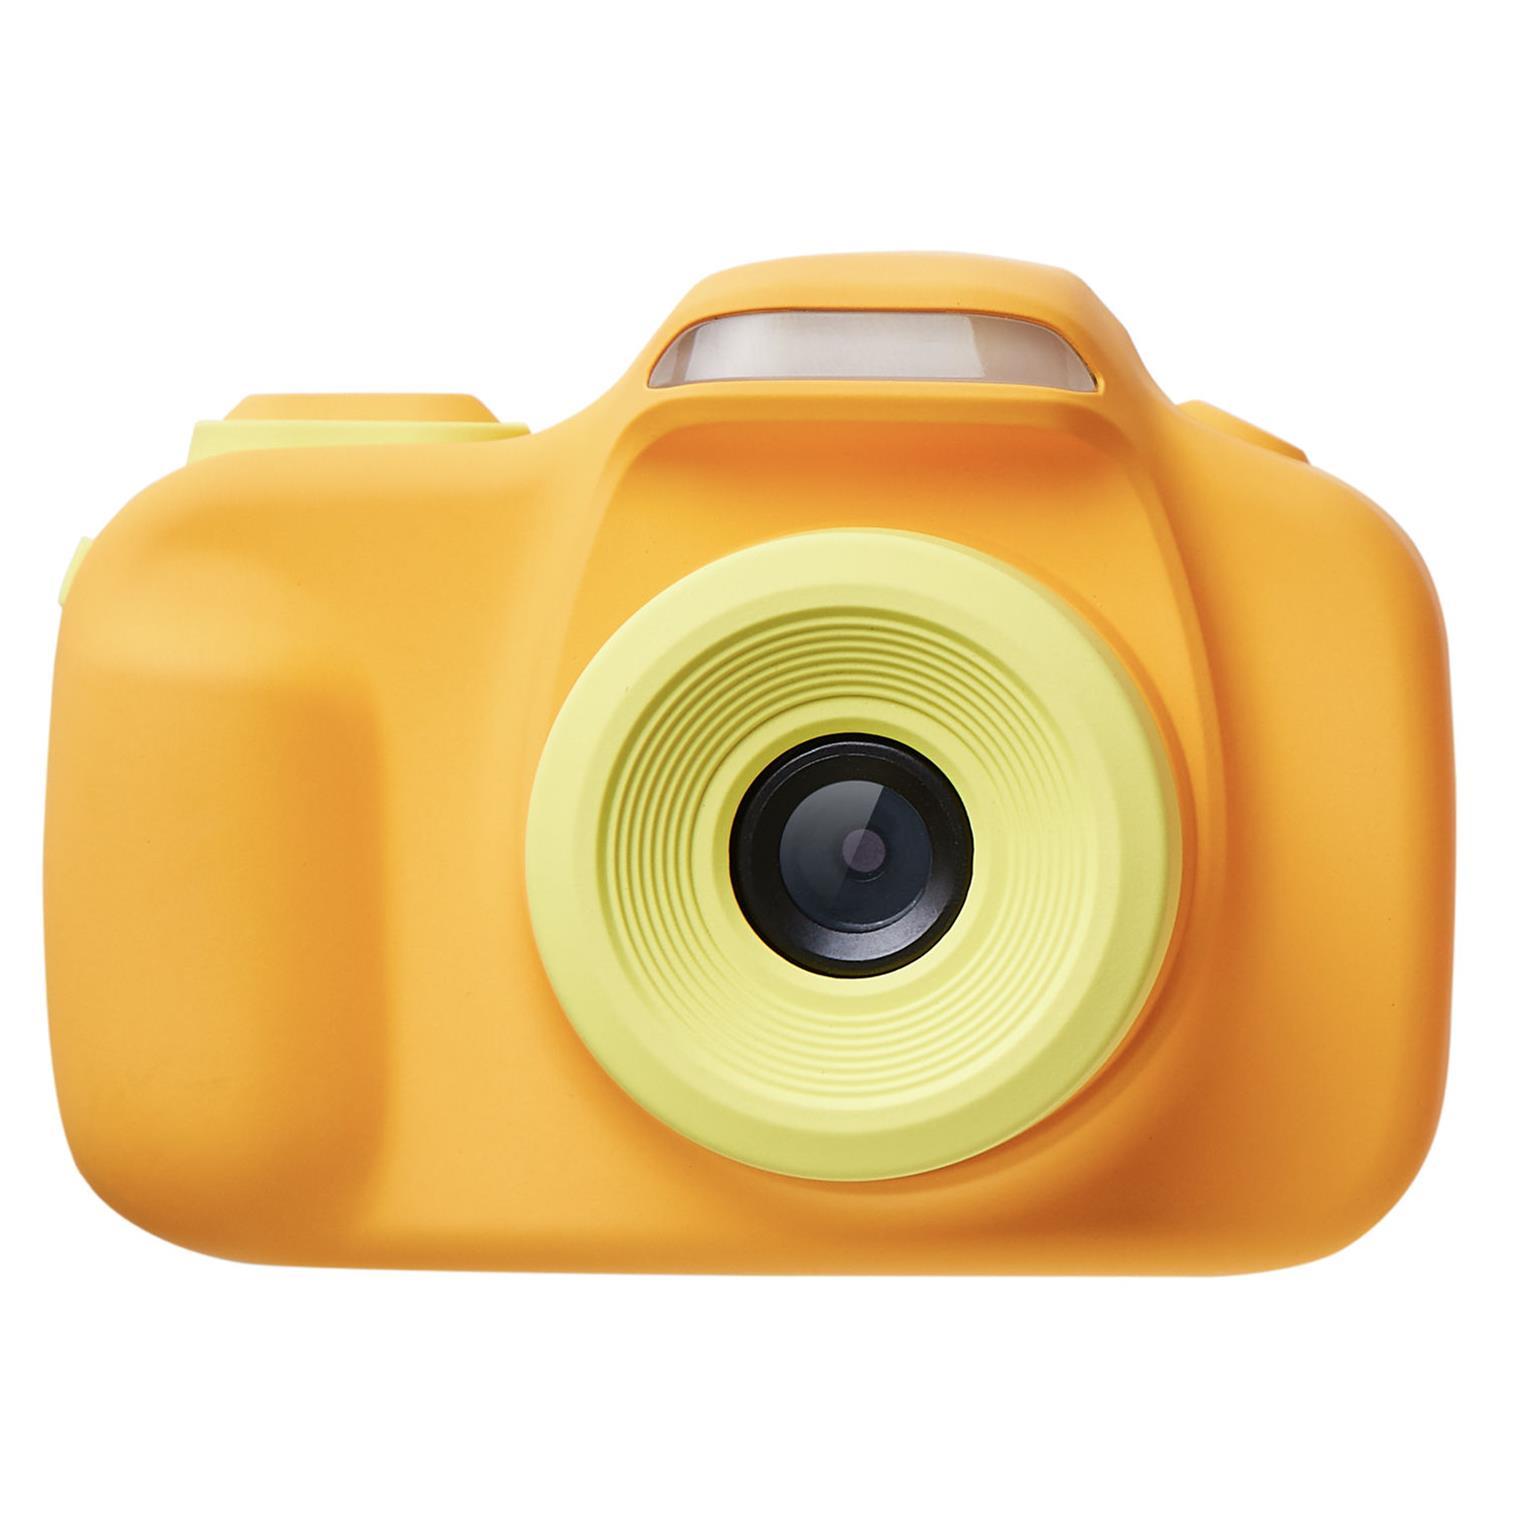 Фотокамеры Артикул 638649388353